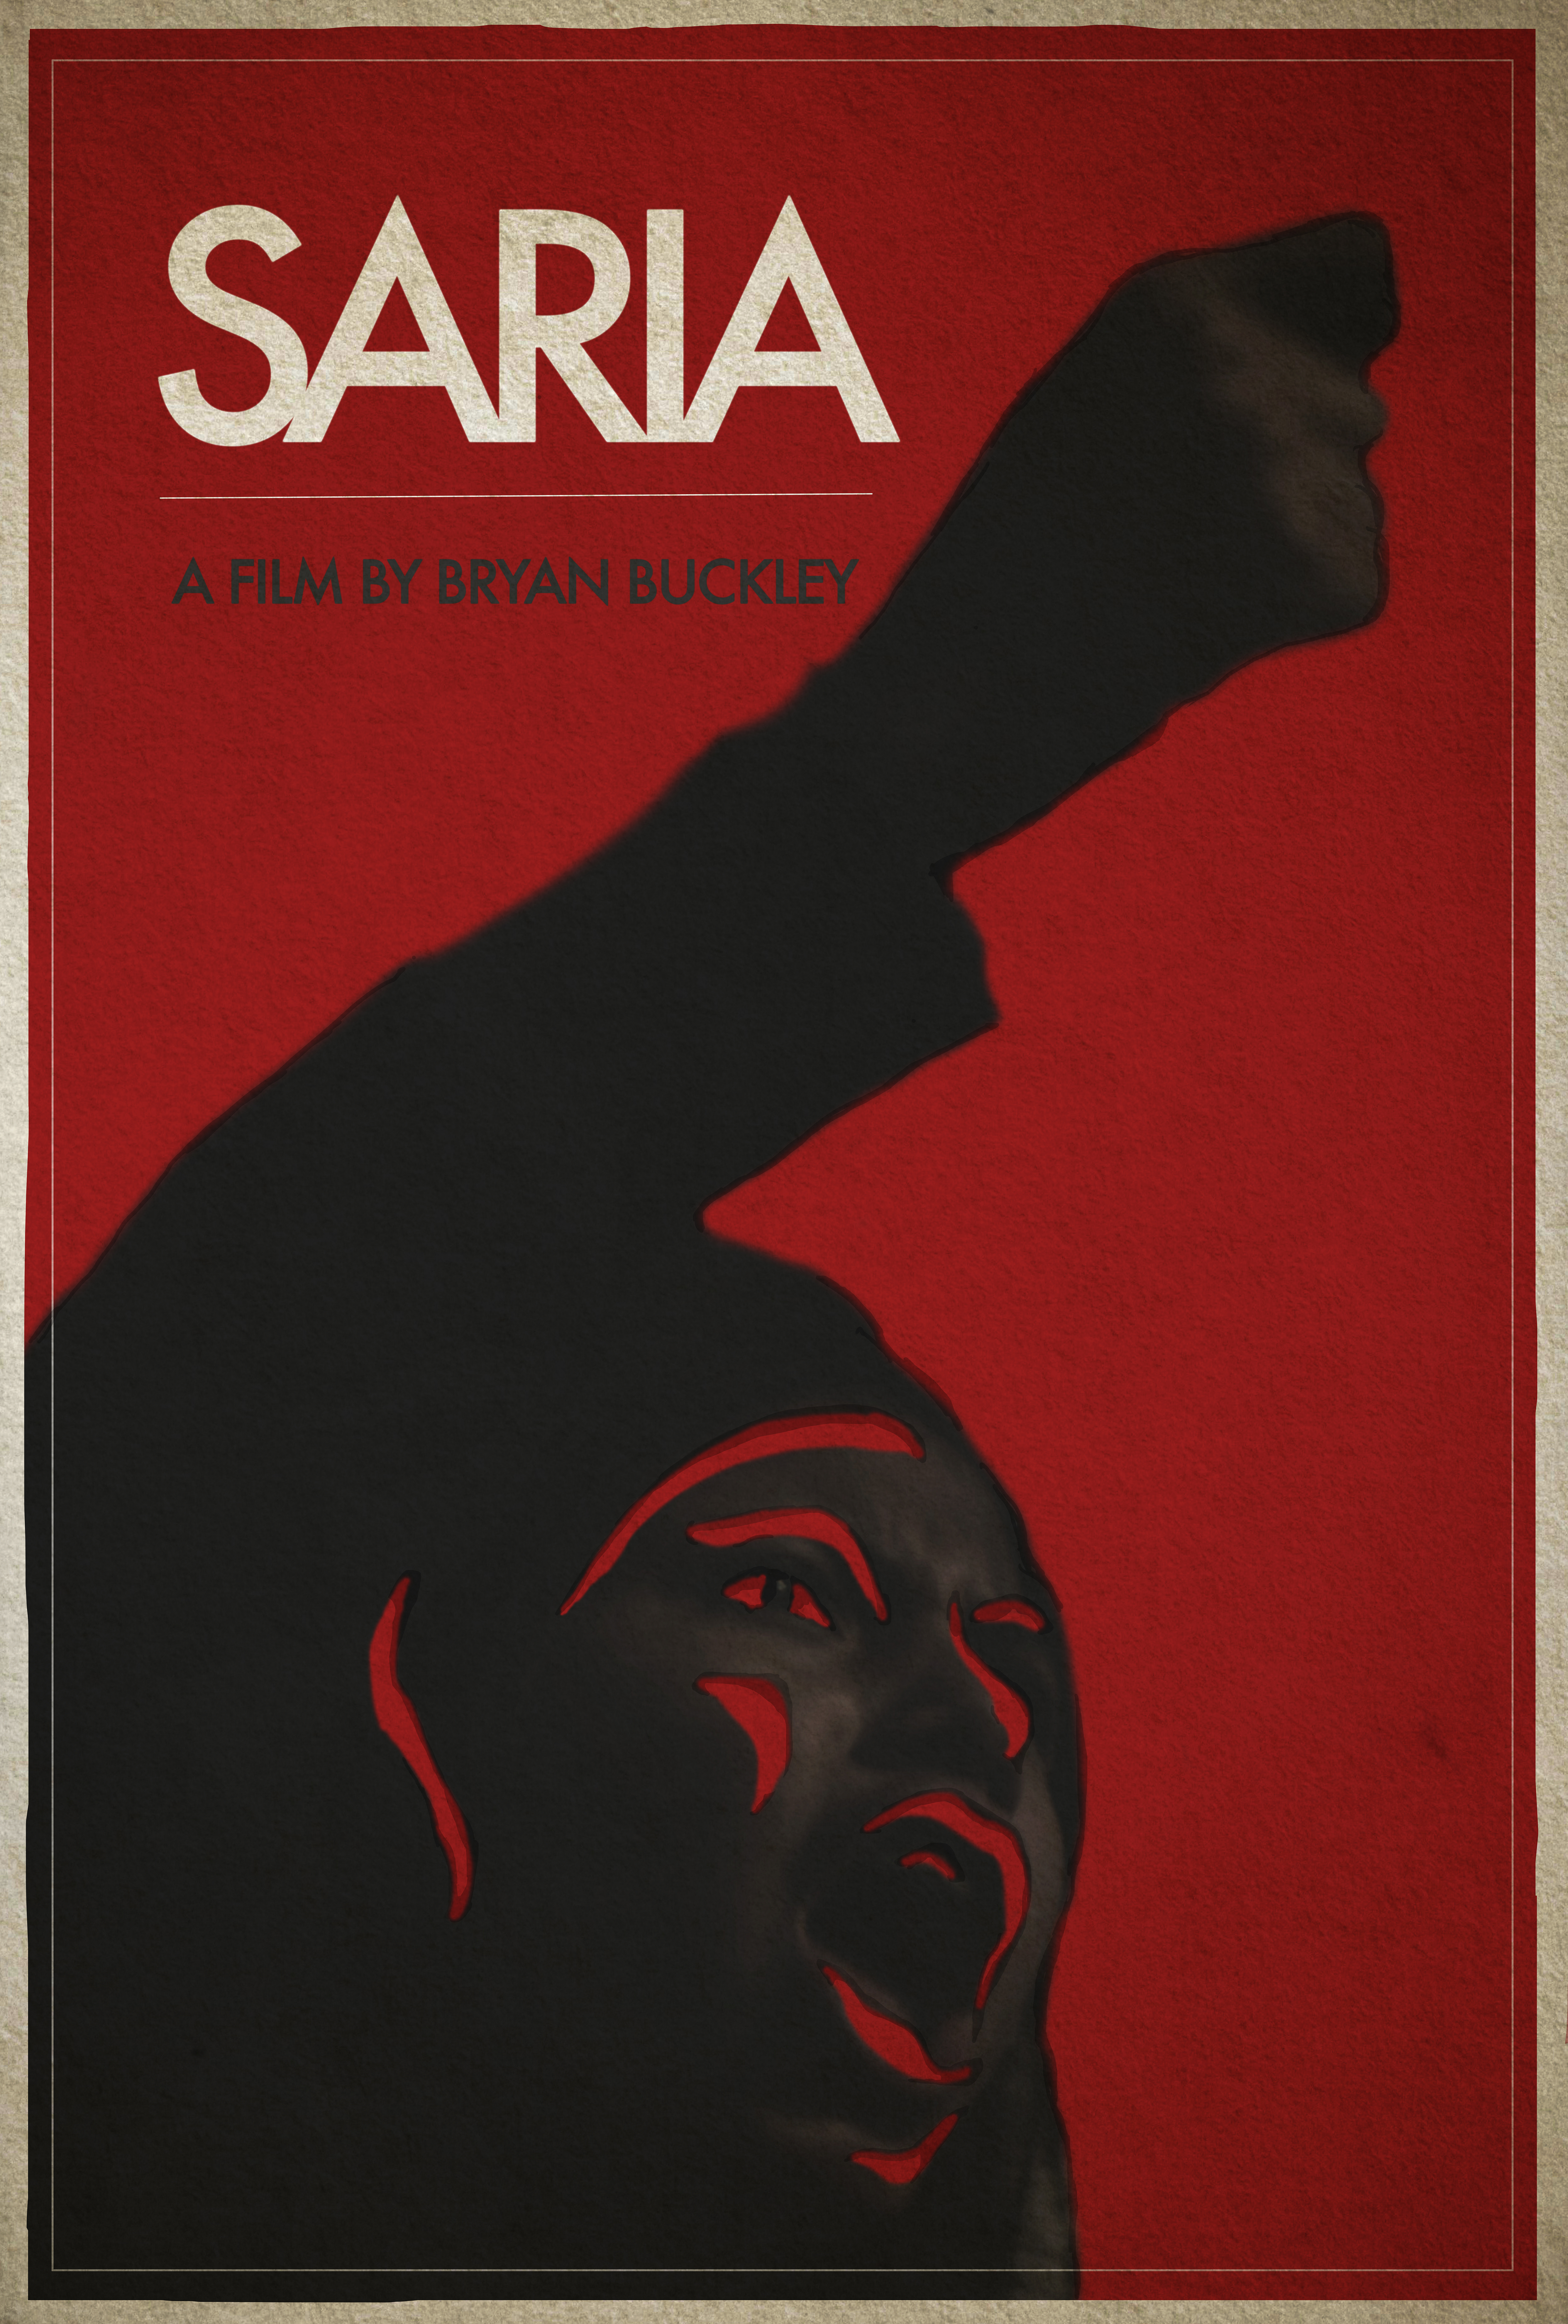 Saria (5) - IMDb